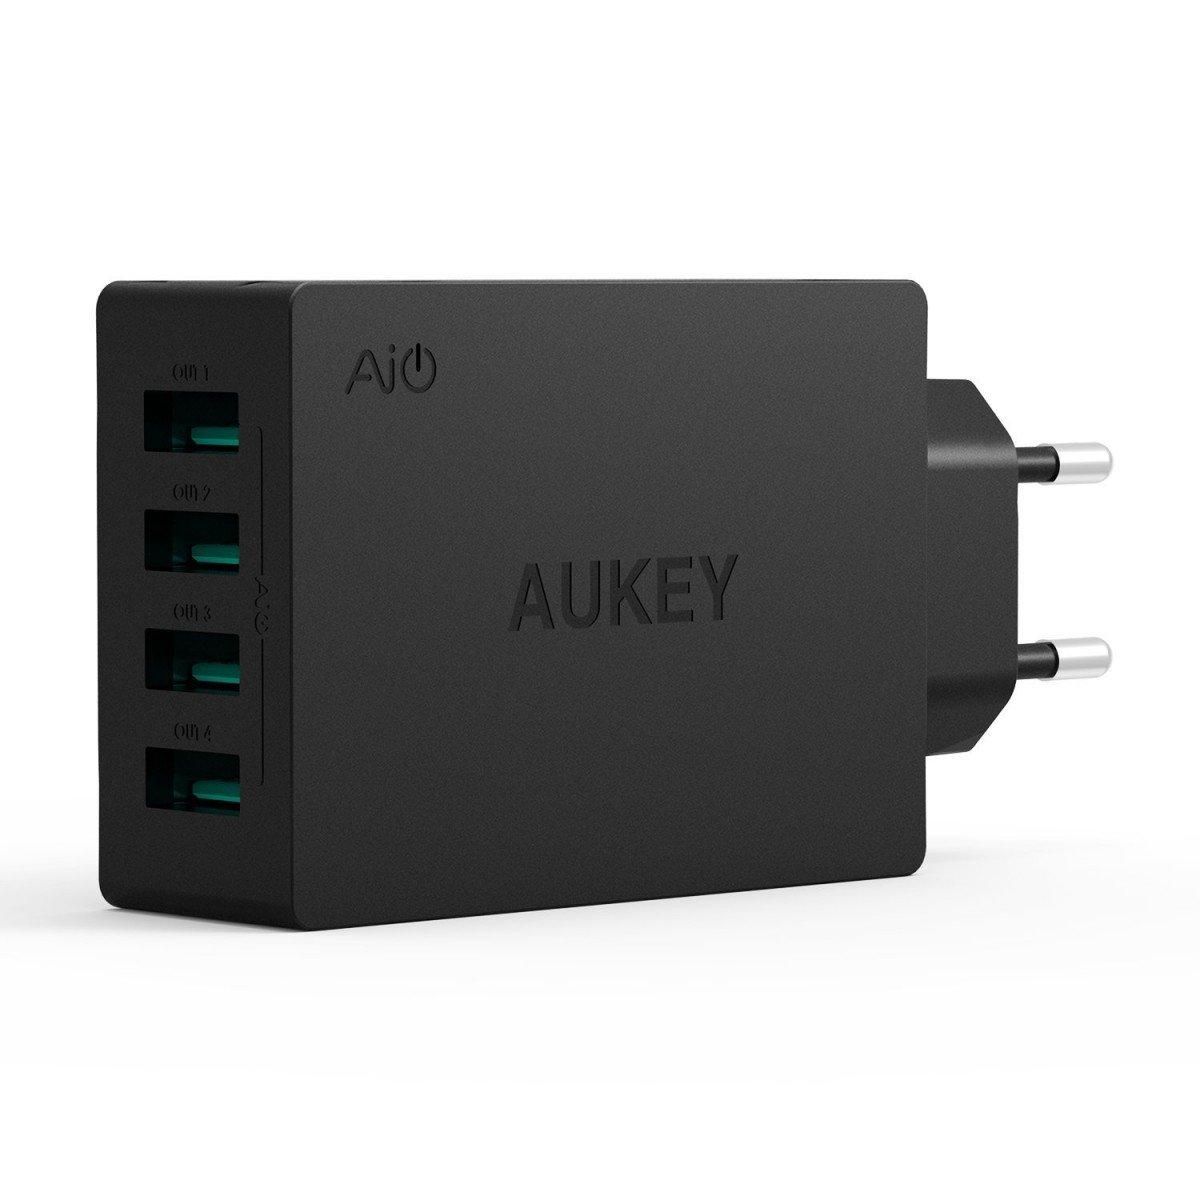 Aukey Caricabatterie da muro USB